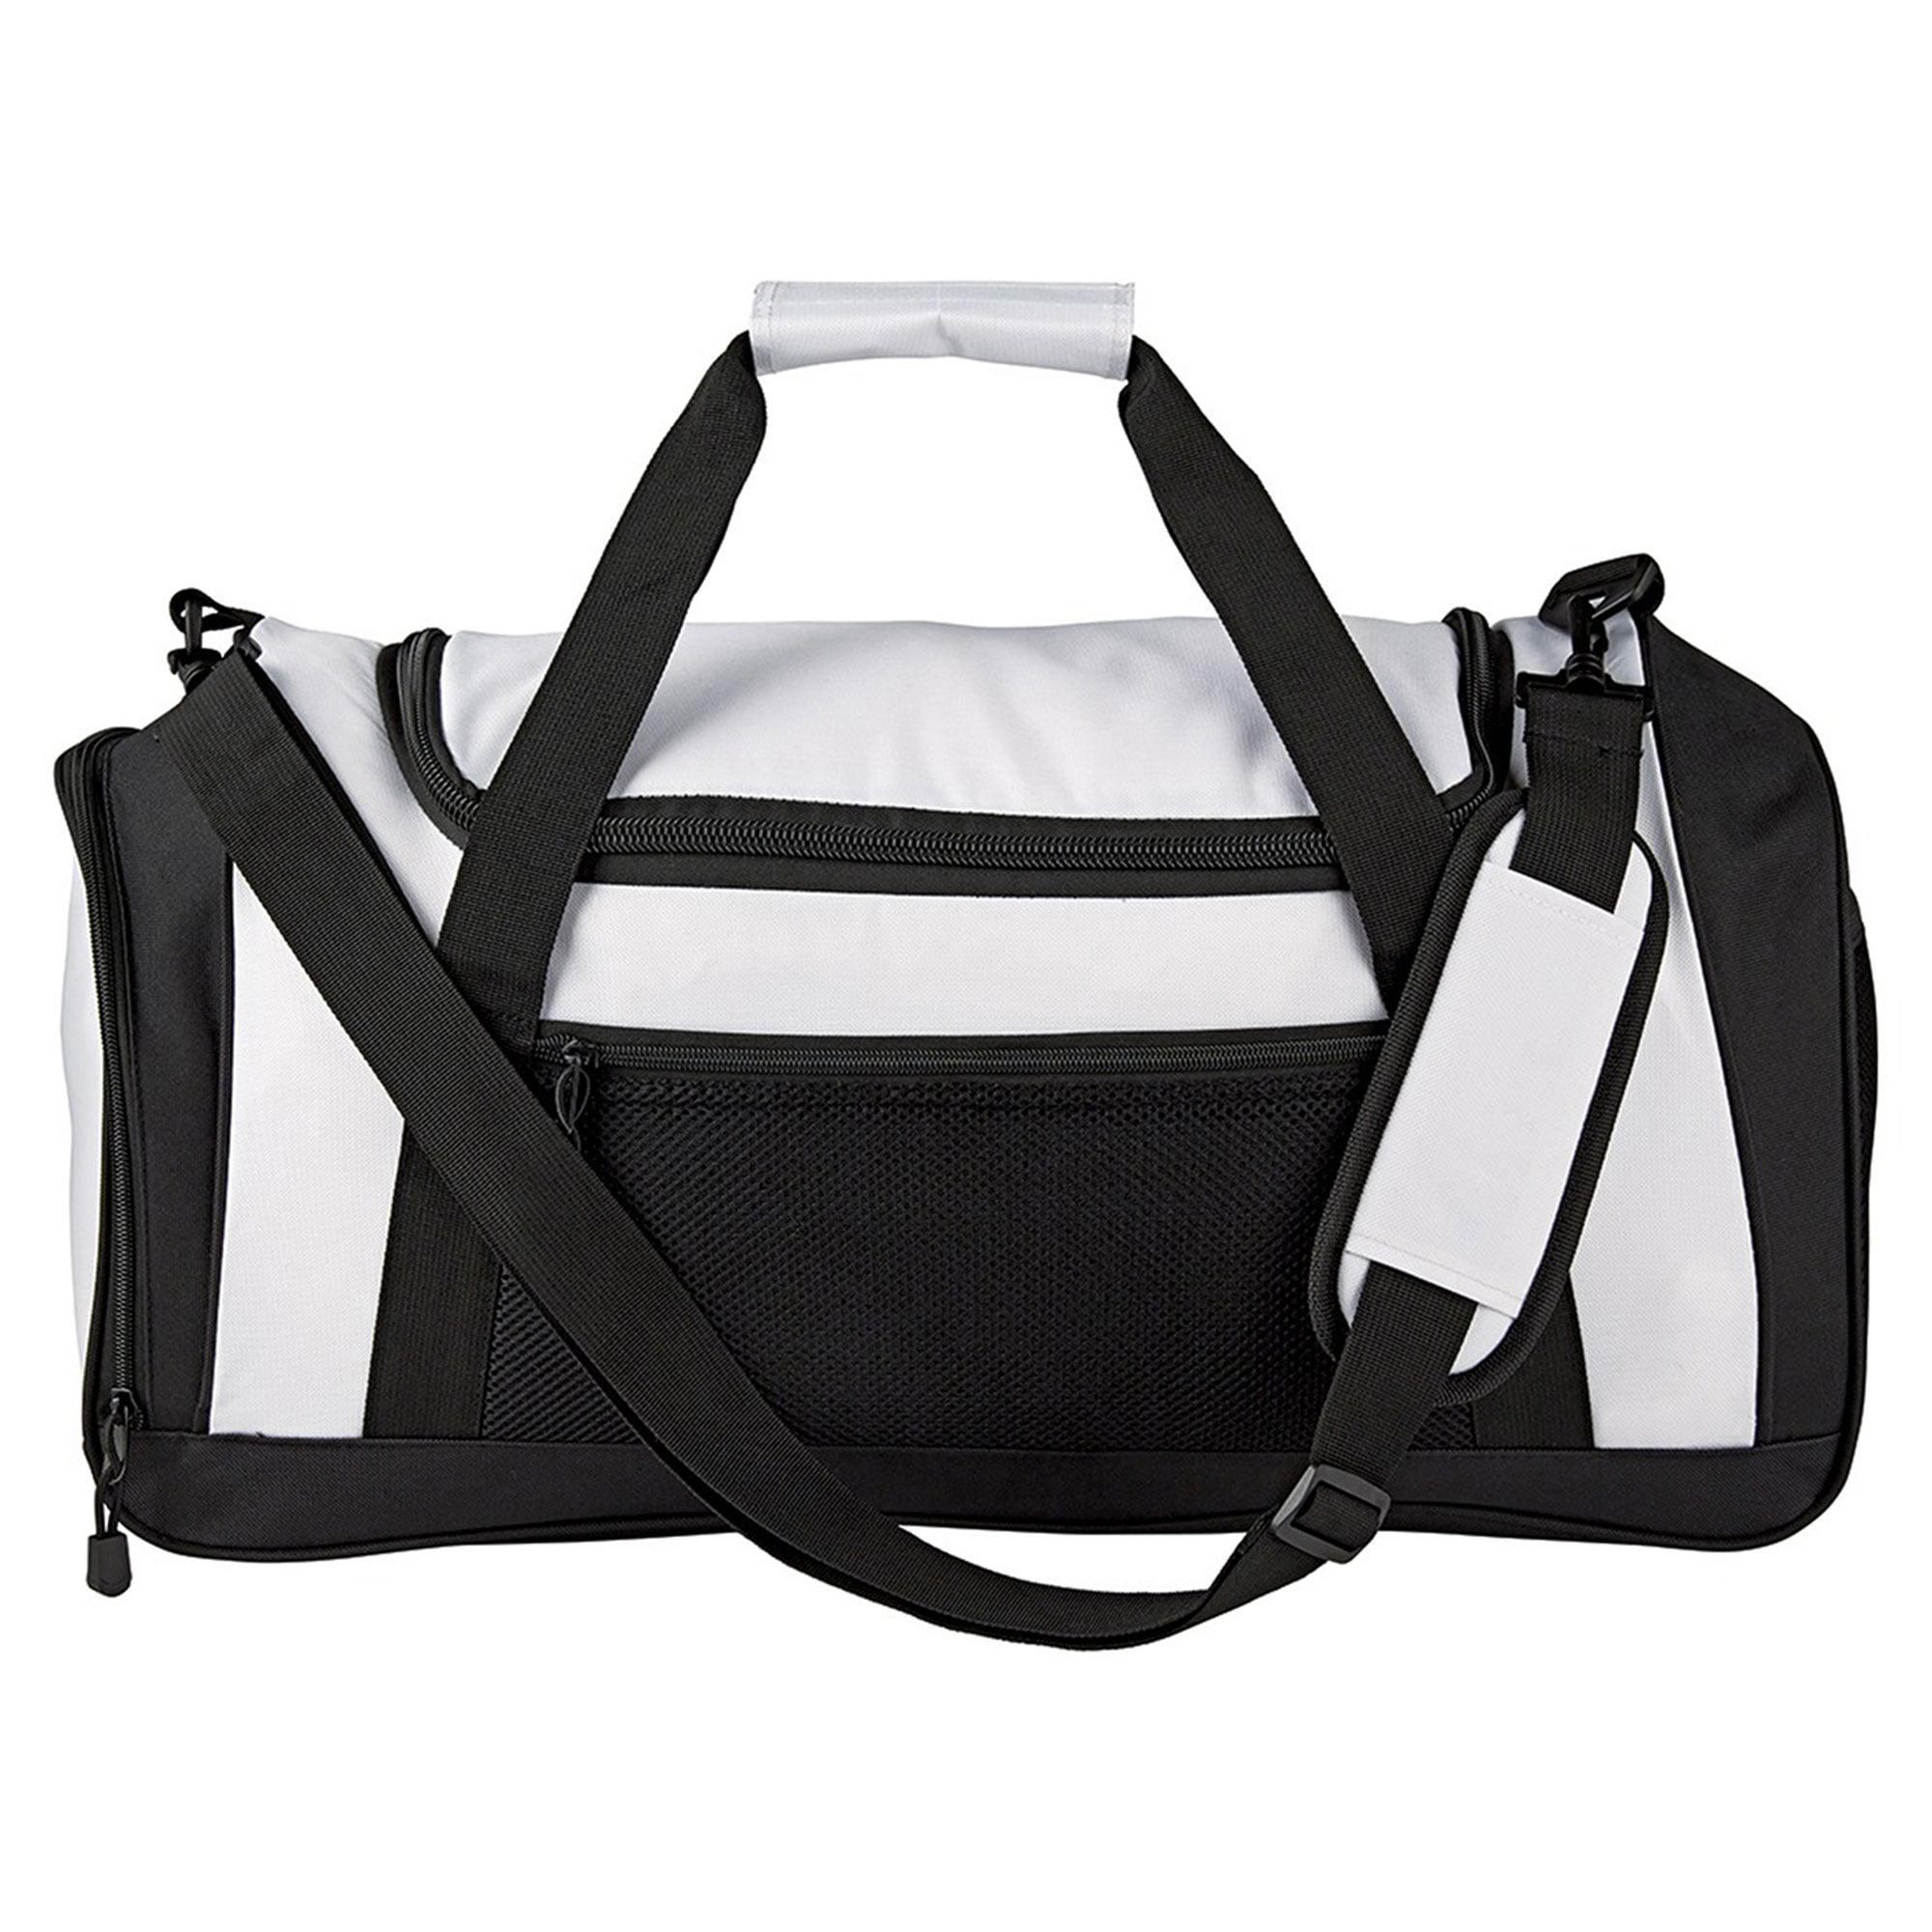 Team Sport Duffel, White, OS, Style, TT110 by Team 365